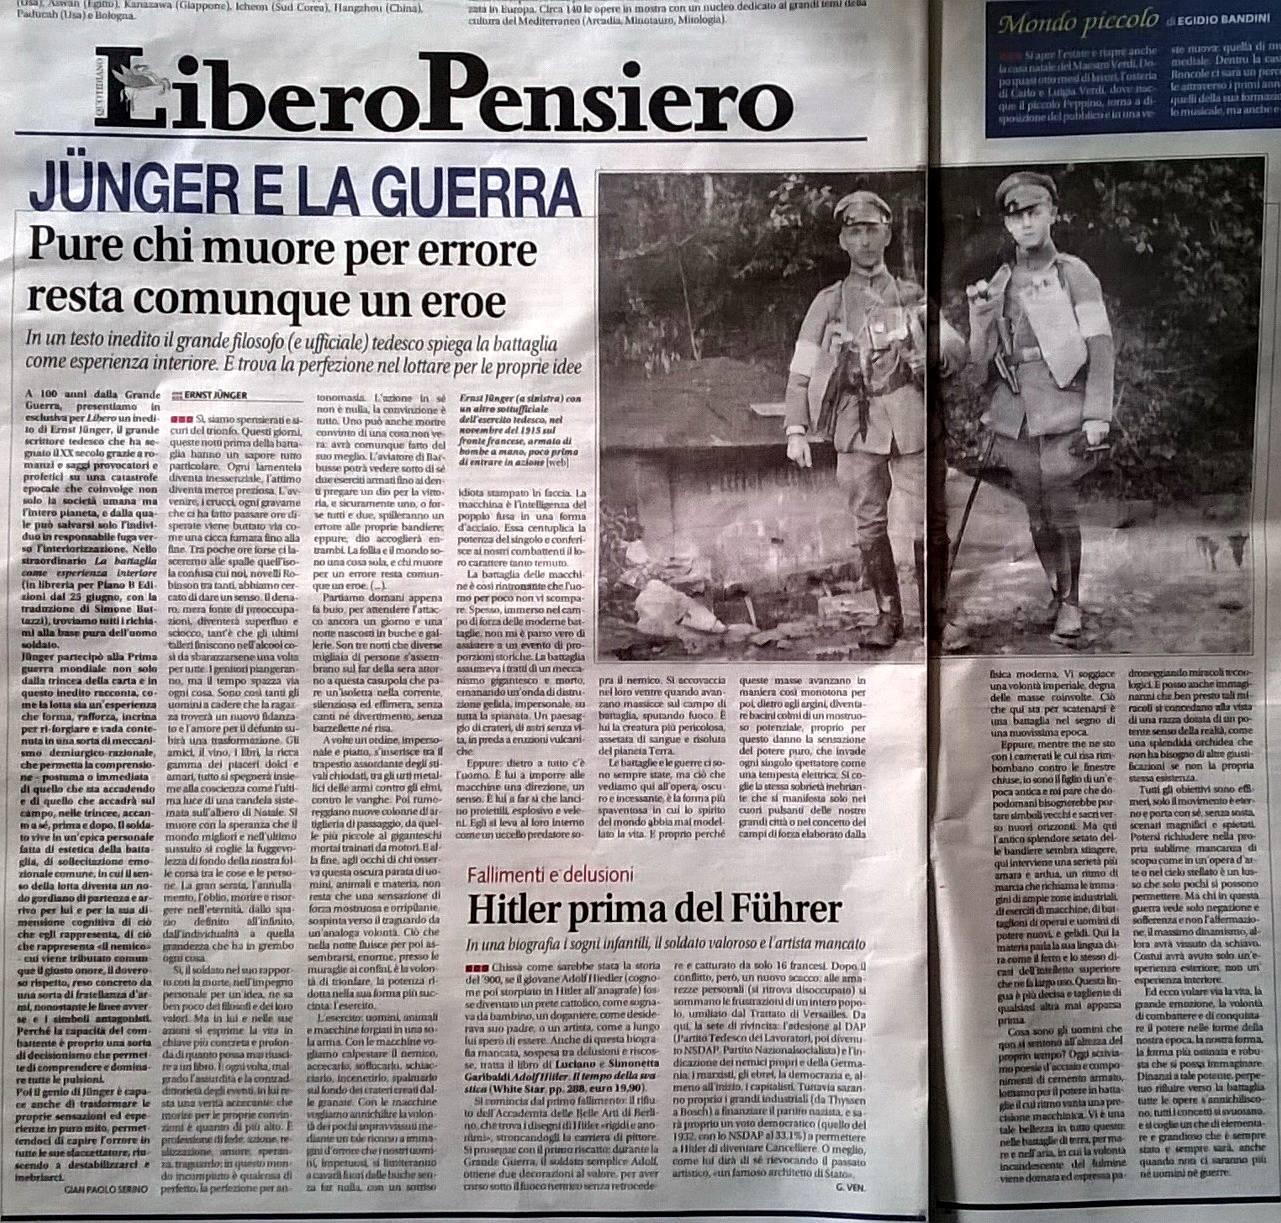 Serino, Jünger e la guerra